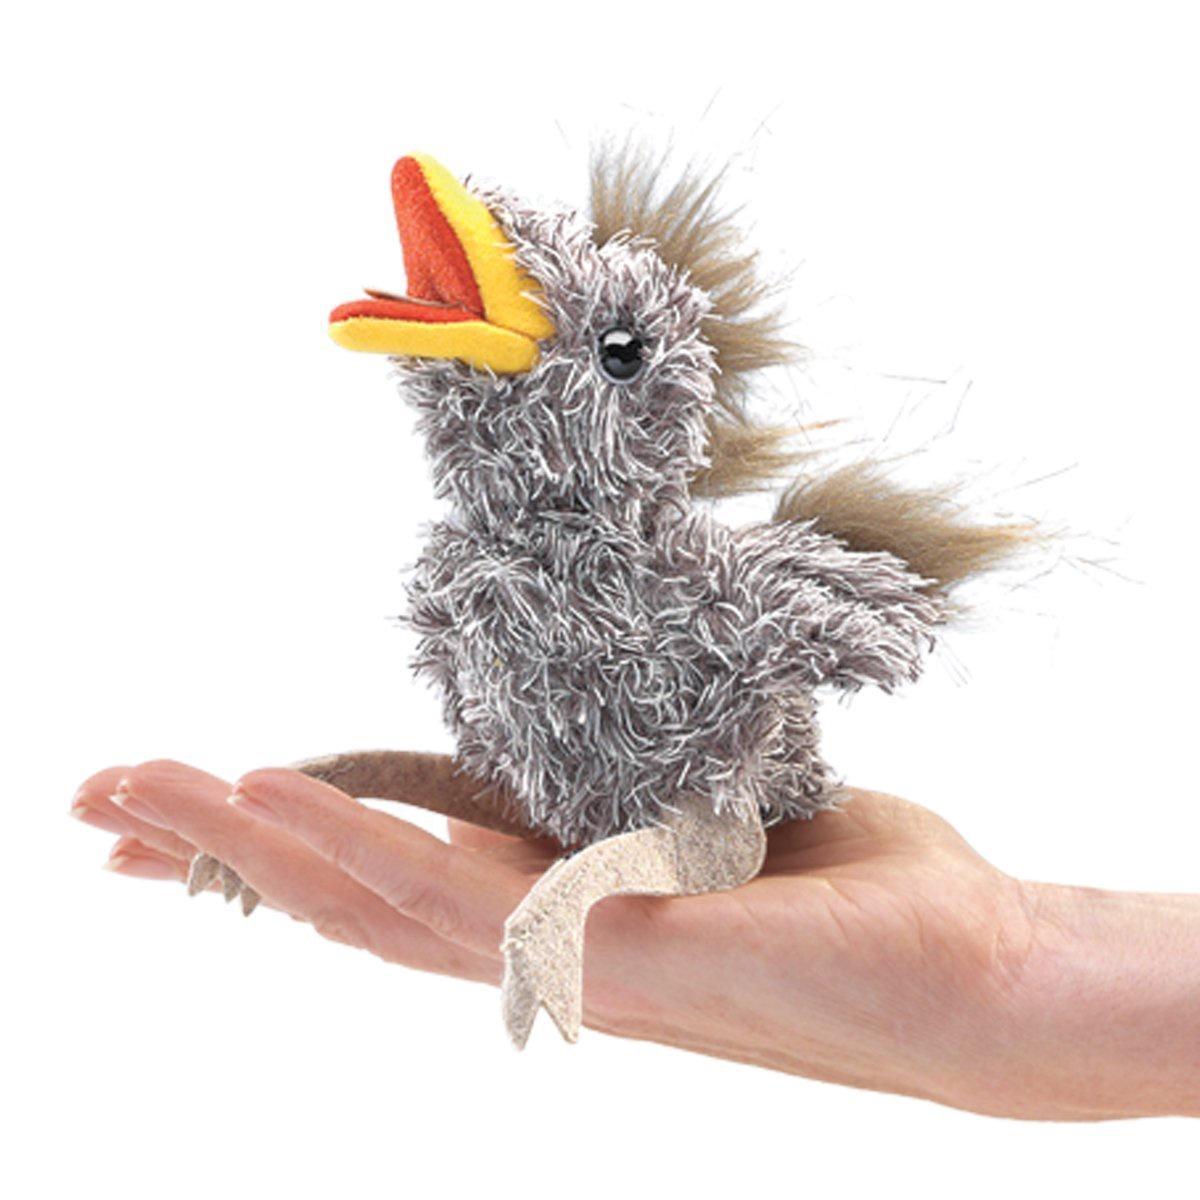 X DC FMI 2758 MINI BABY BIRD